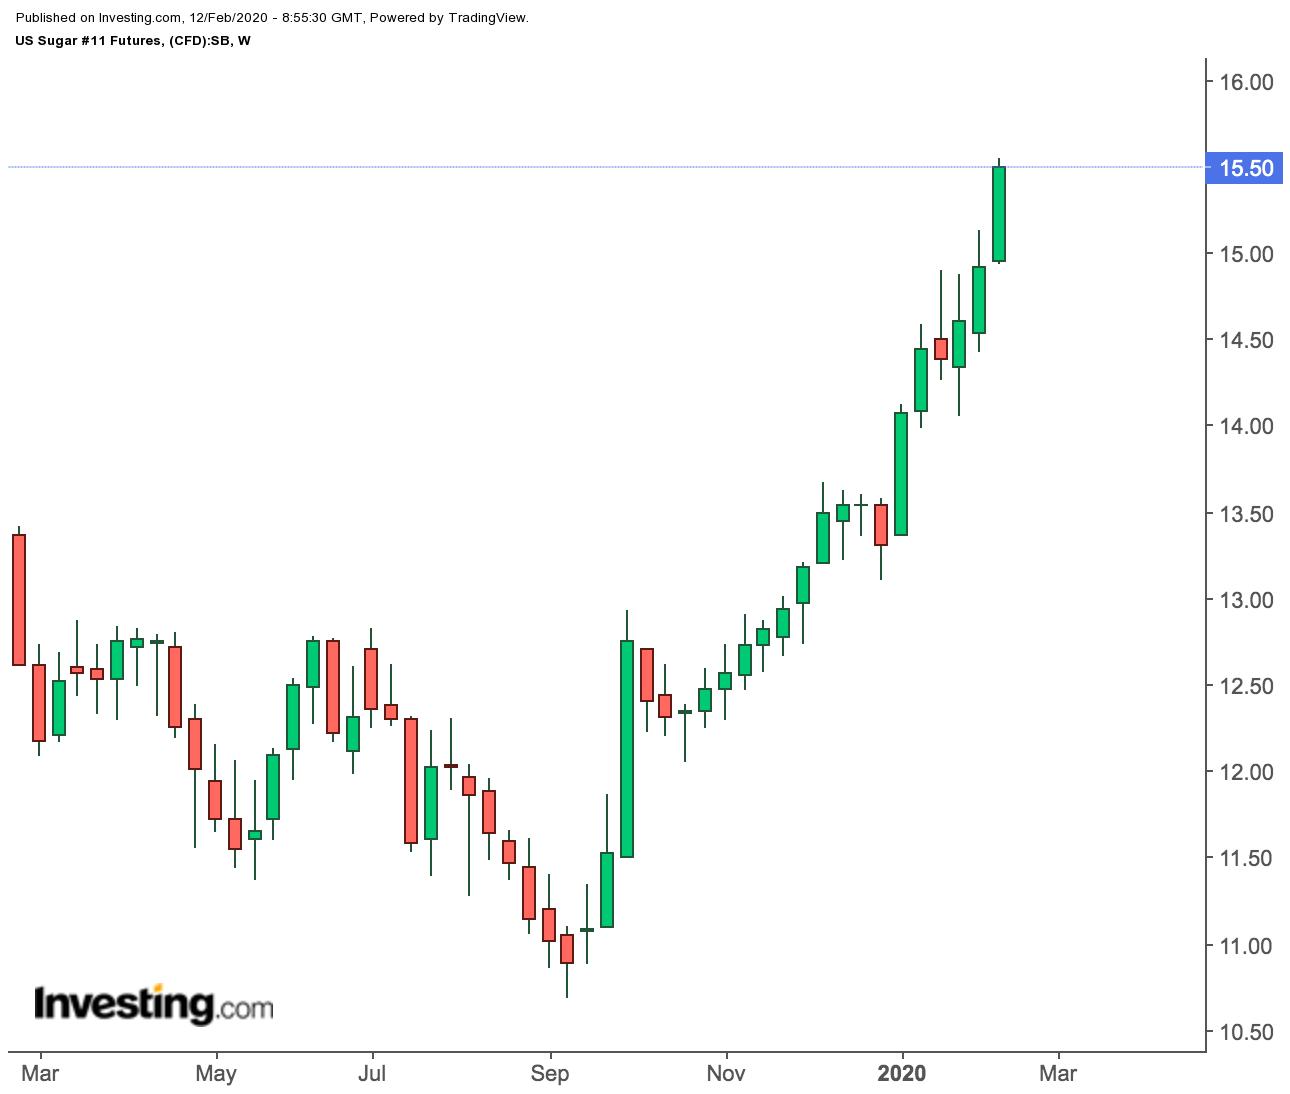 U.S. Sugar Futures Weekly Price Chart